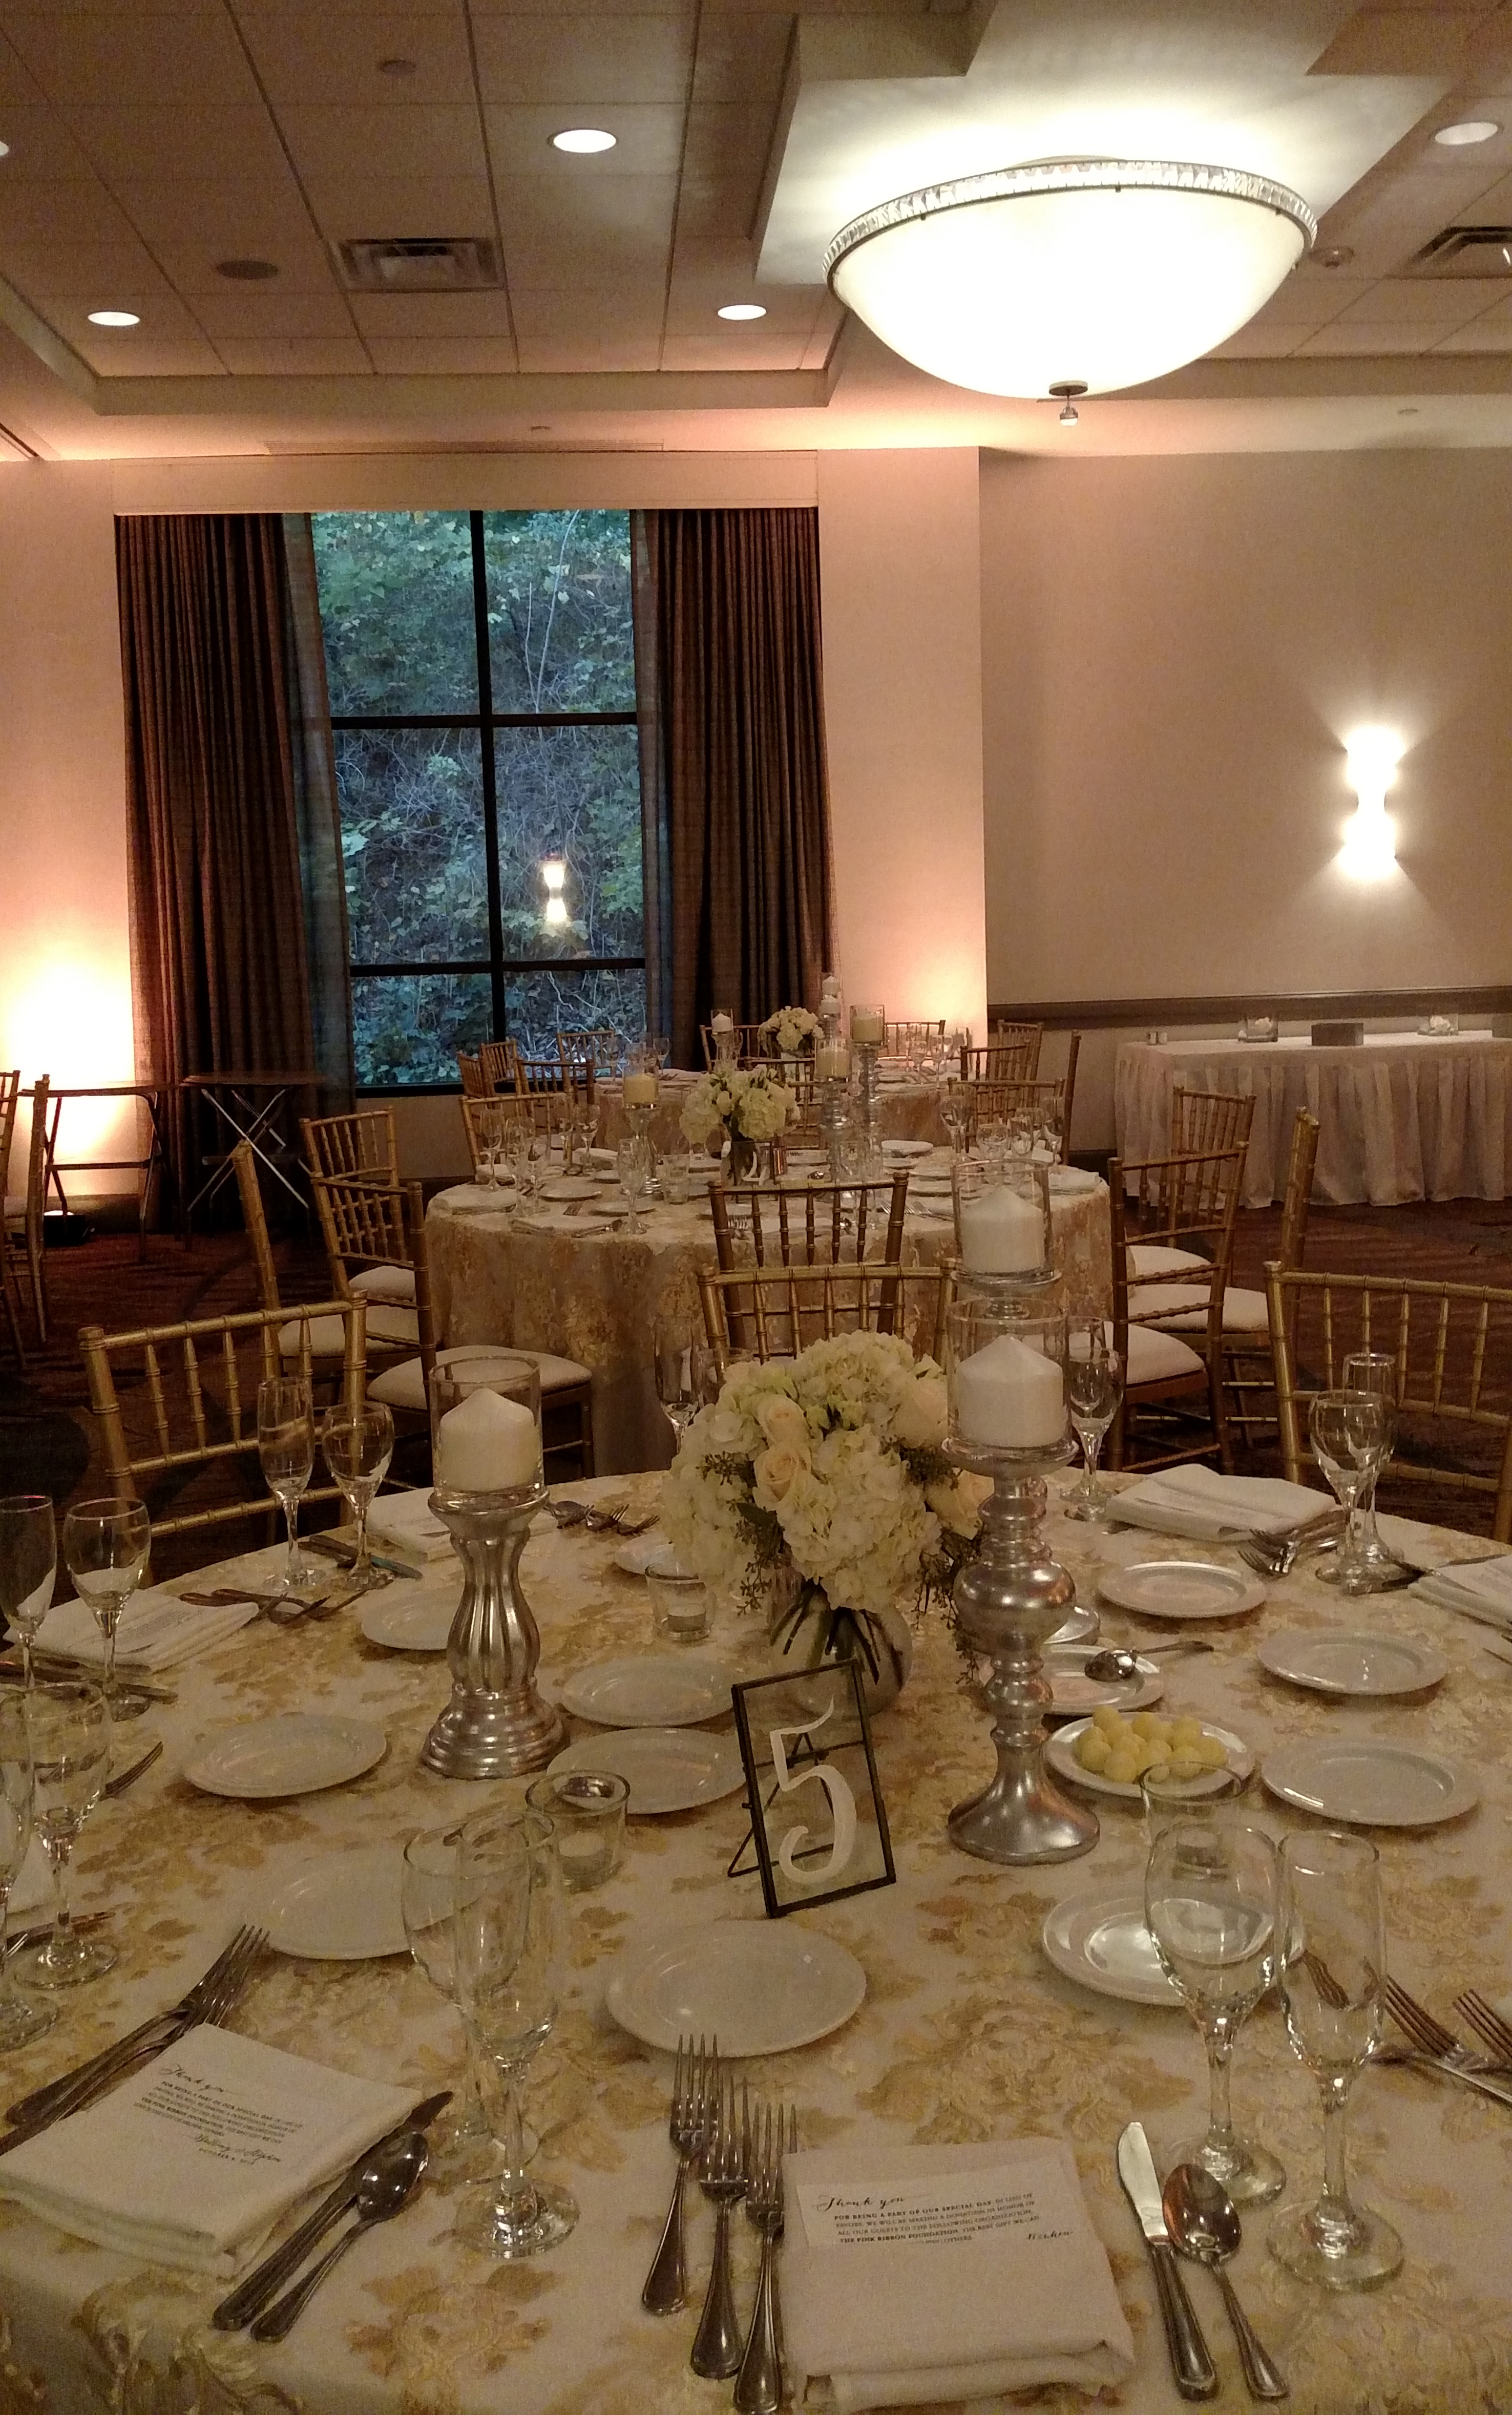 pam-3-rivers-ballroom-chiavari-chairs-fancy-linens